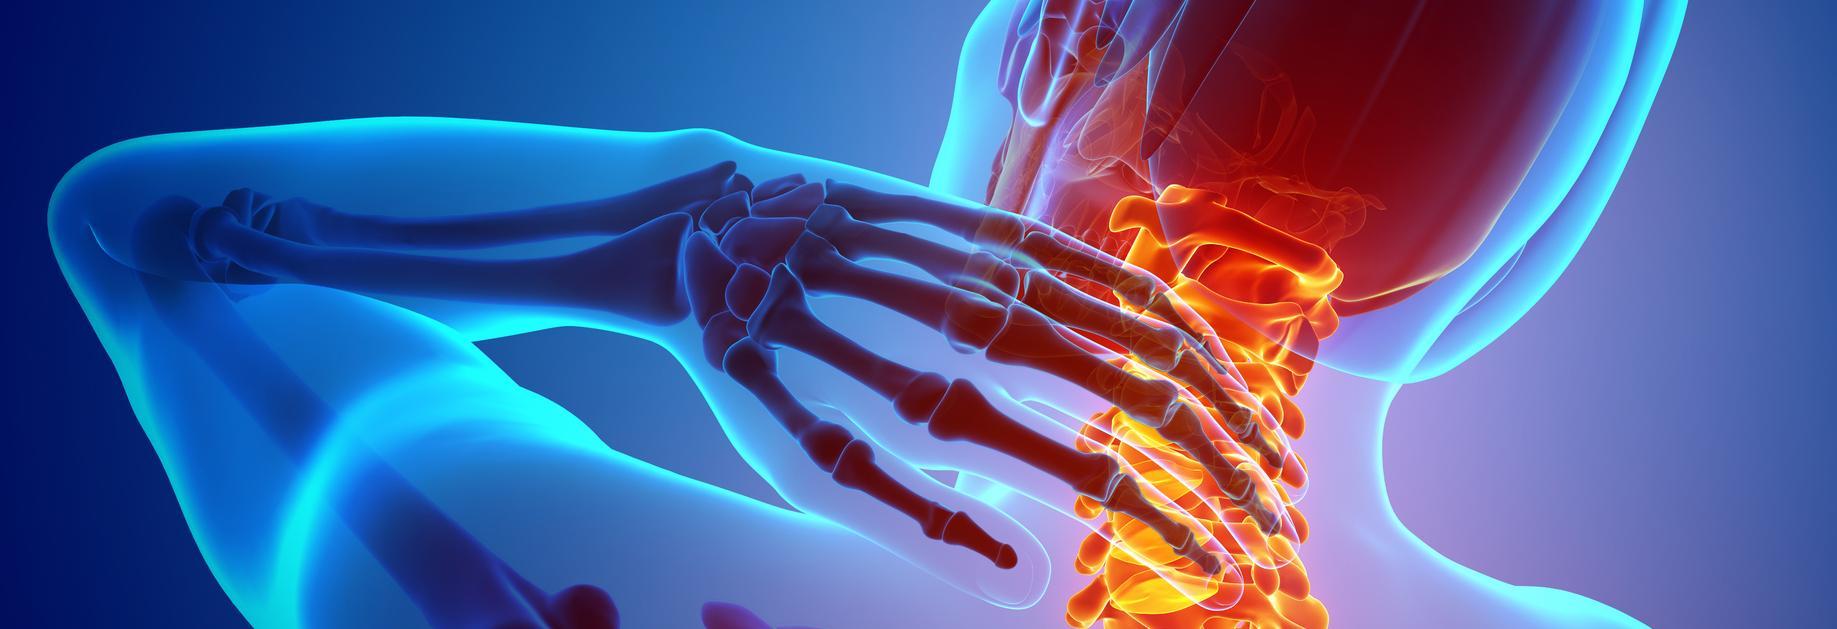 renew medical stem cell treatment pain therapy cincinnati ohio